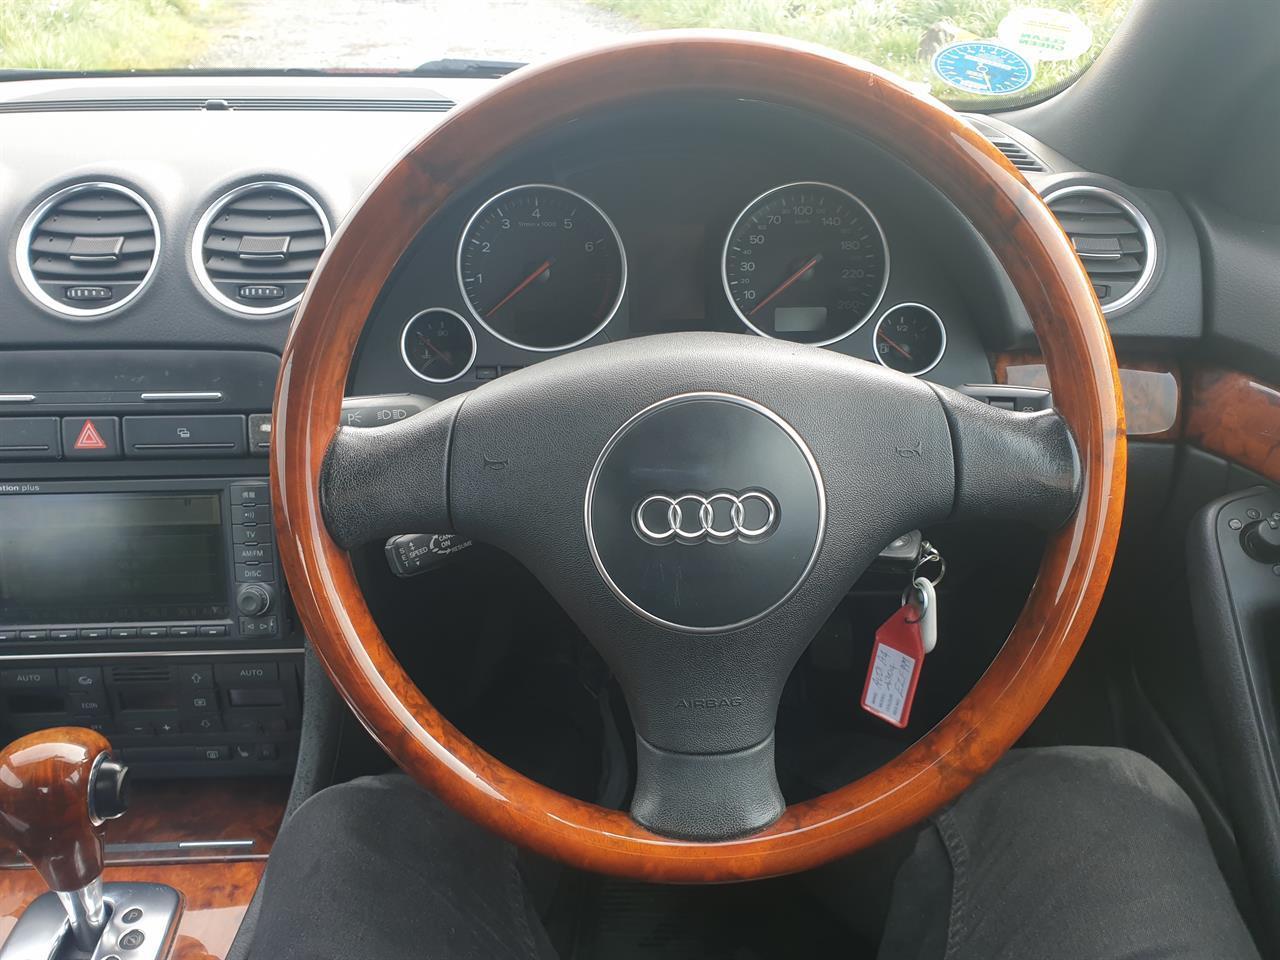 image-9, 2003 Audi A4 at Invercargill